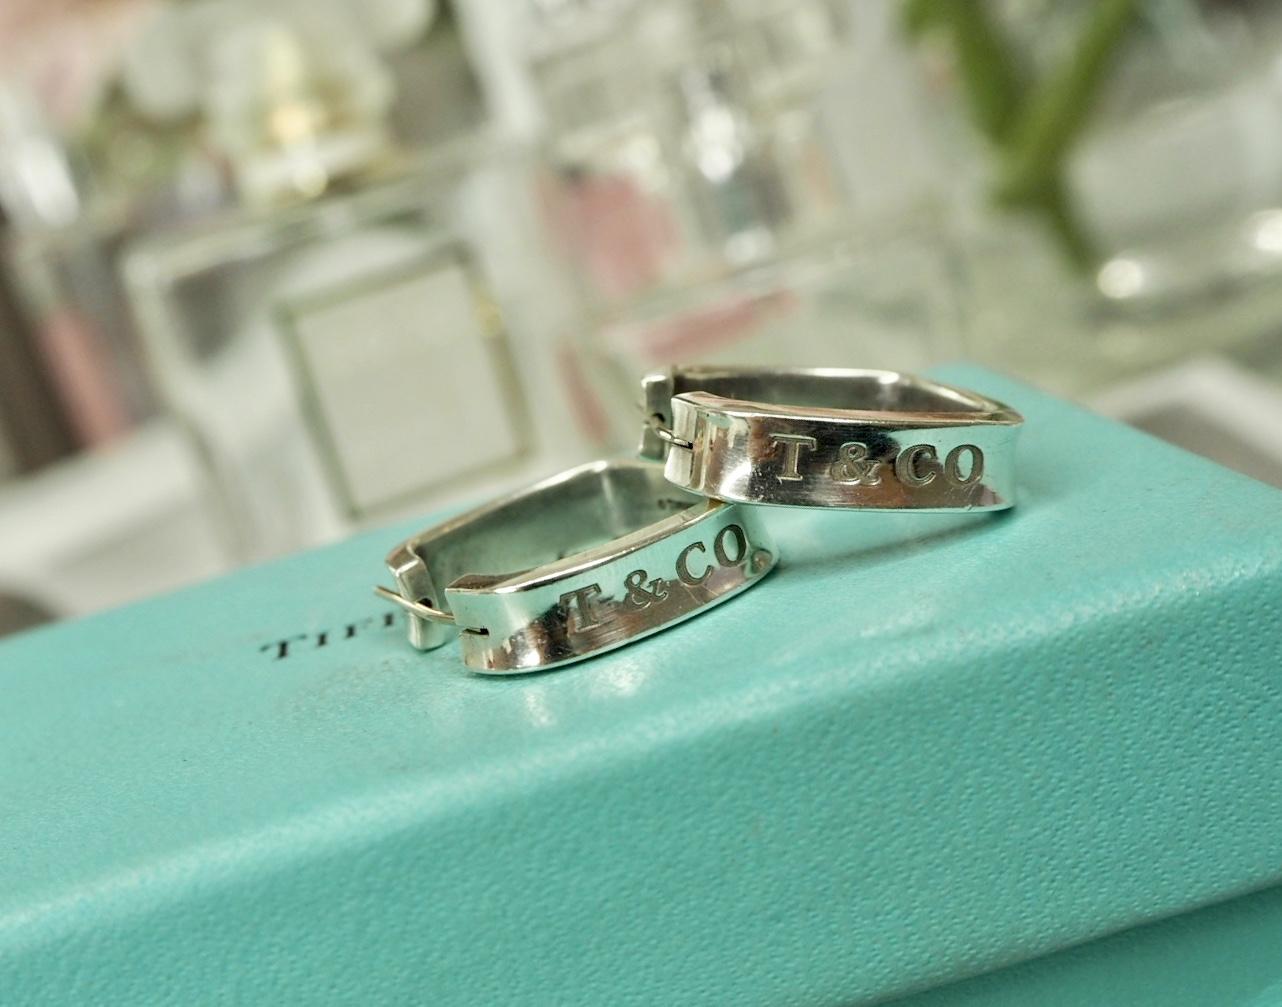 Tiffany Earrings with gift box. Inkerman luxury wish list.